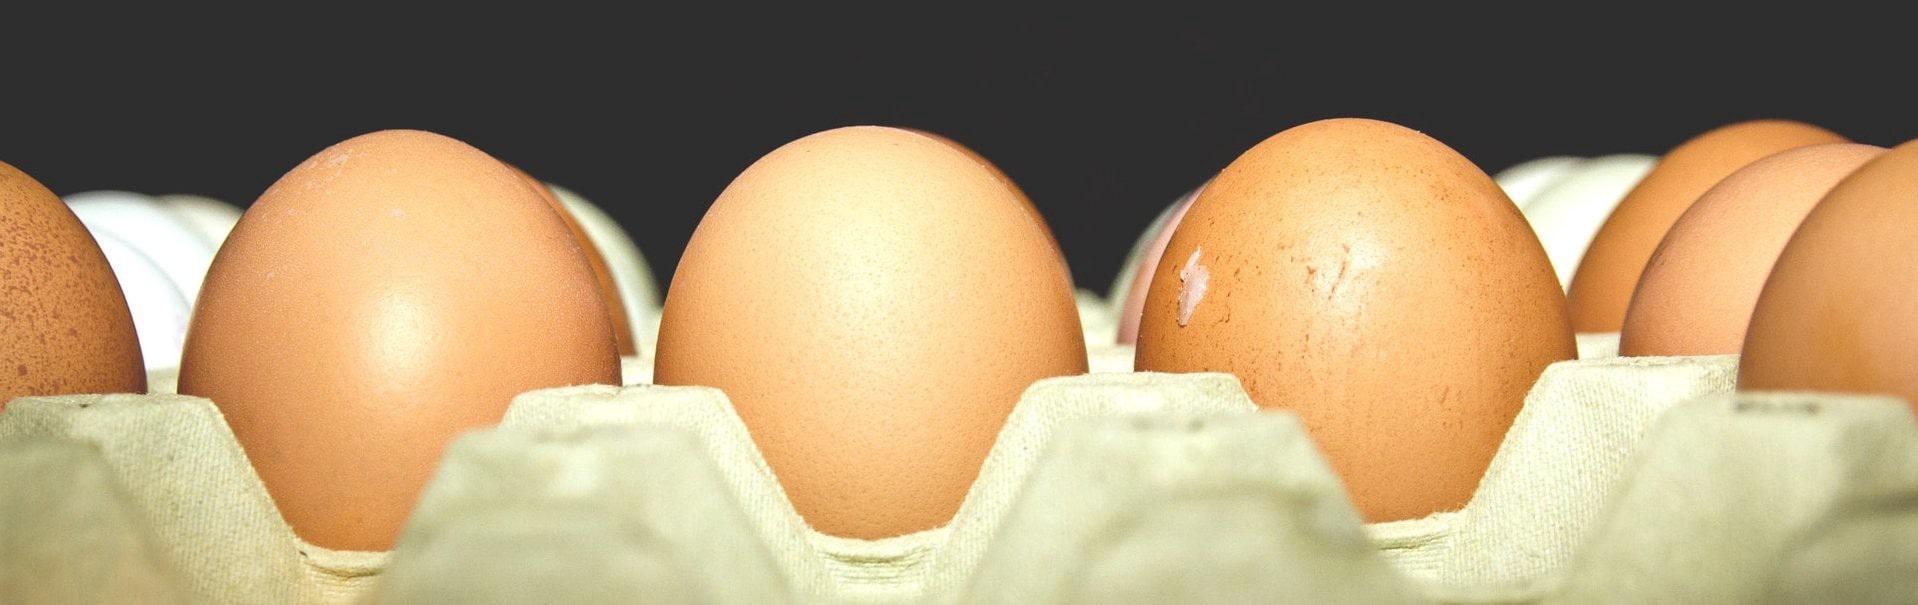 the eggsercise scandiweb